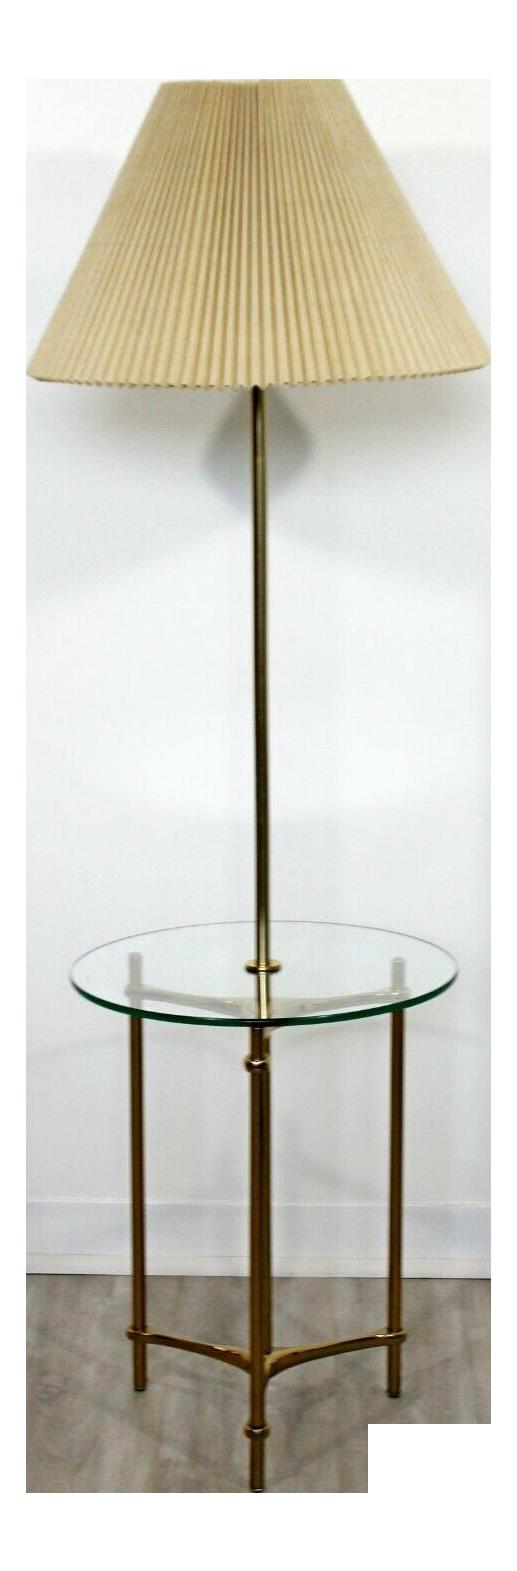 Mid Century Modern Laurel Brass Glass Tripod Floor Lamp Table 1970s Orig Shade Chairish